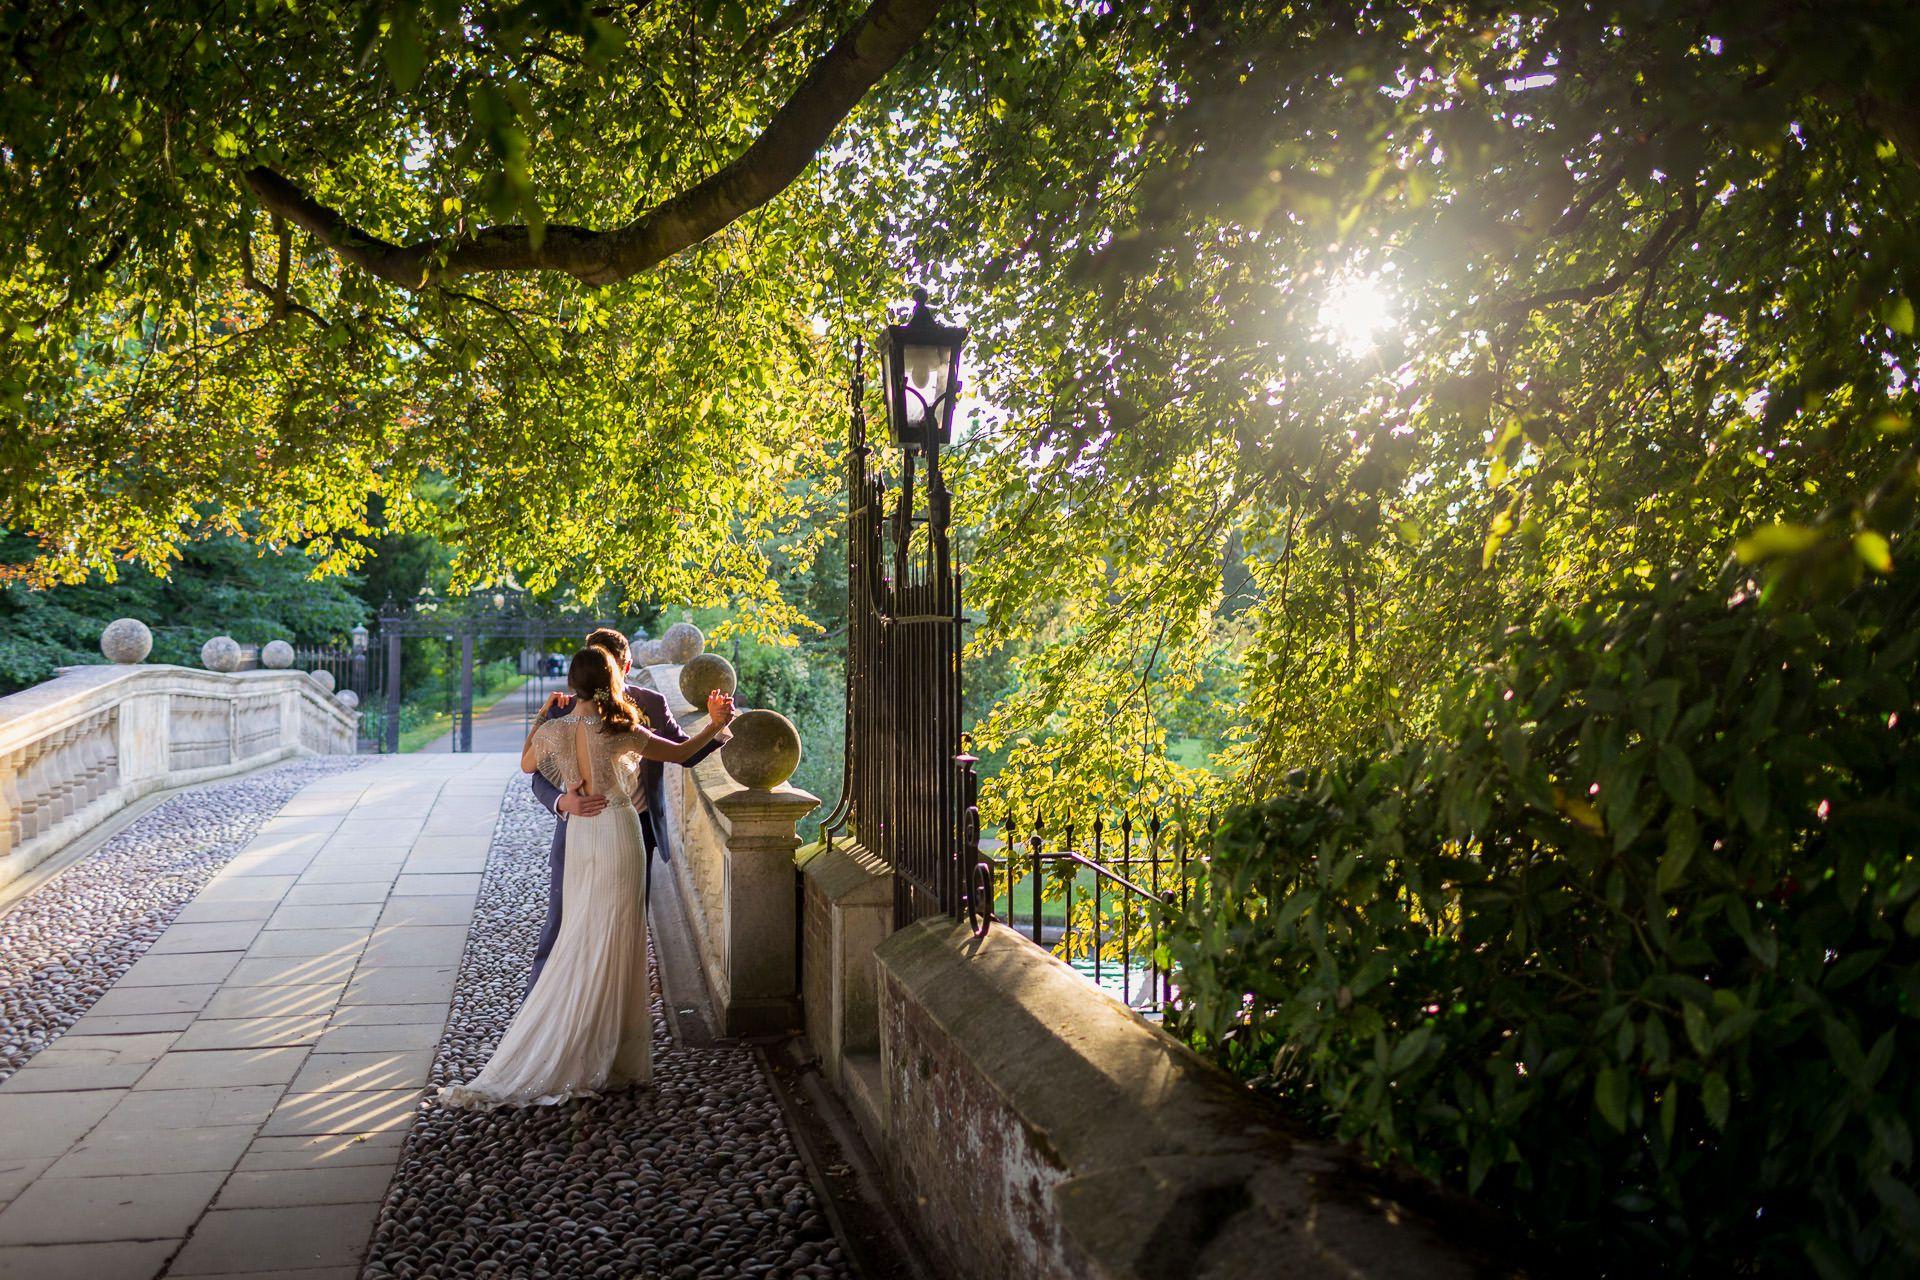 london wedding photo session